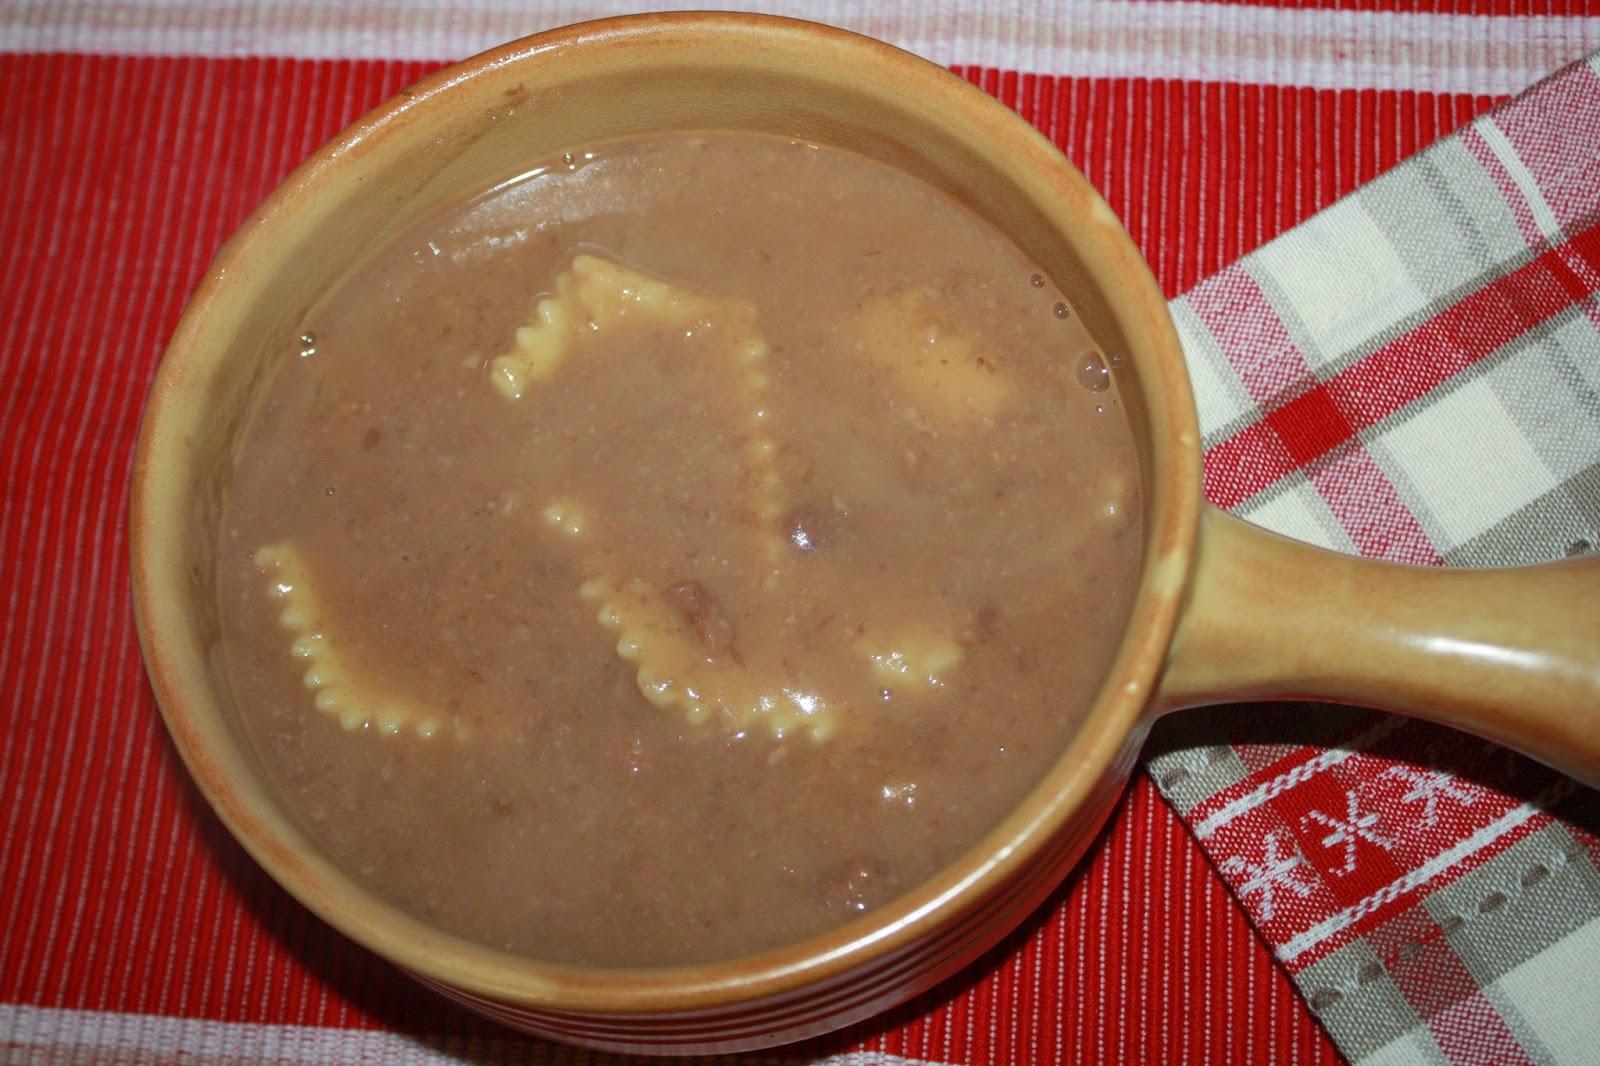 La Cuciniera Moderna: Pasta e fagioli, ricetta veneta